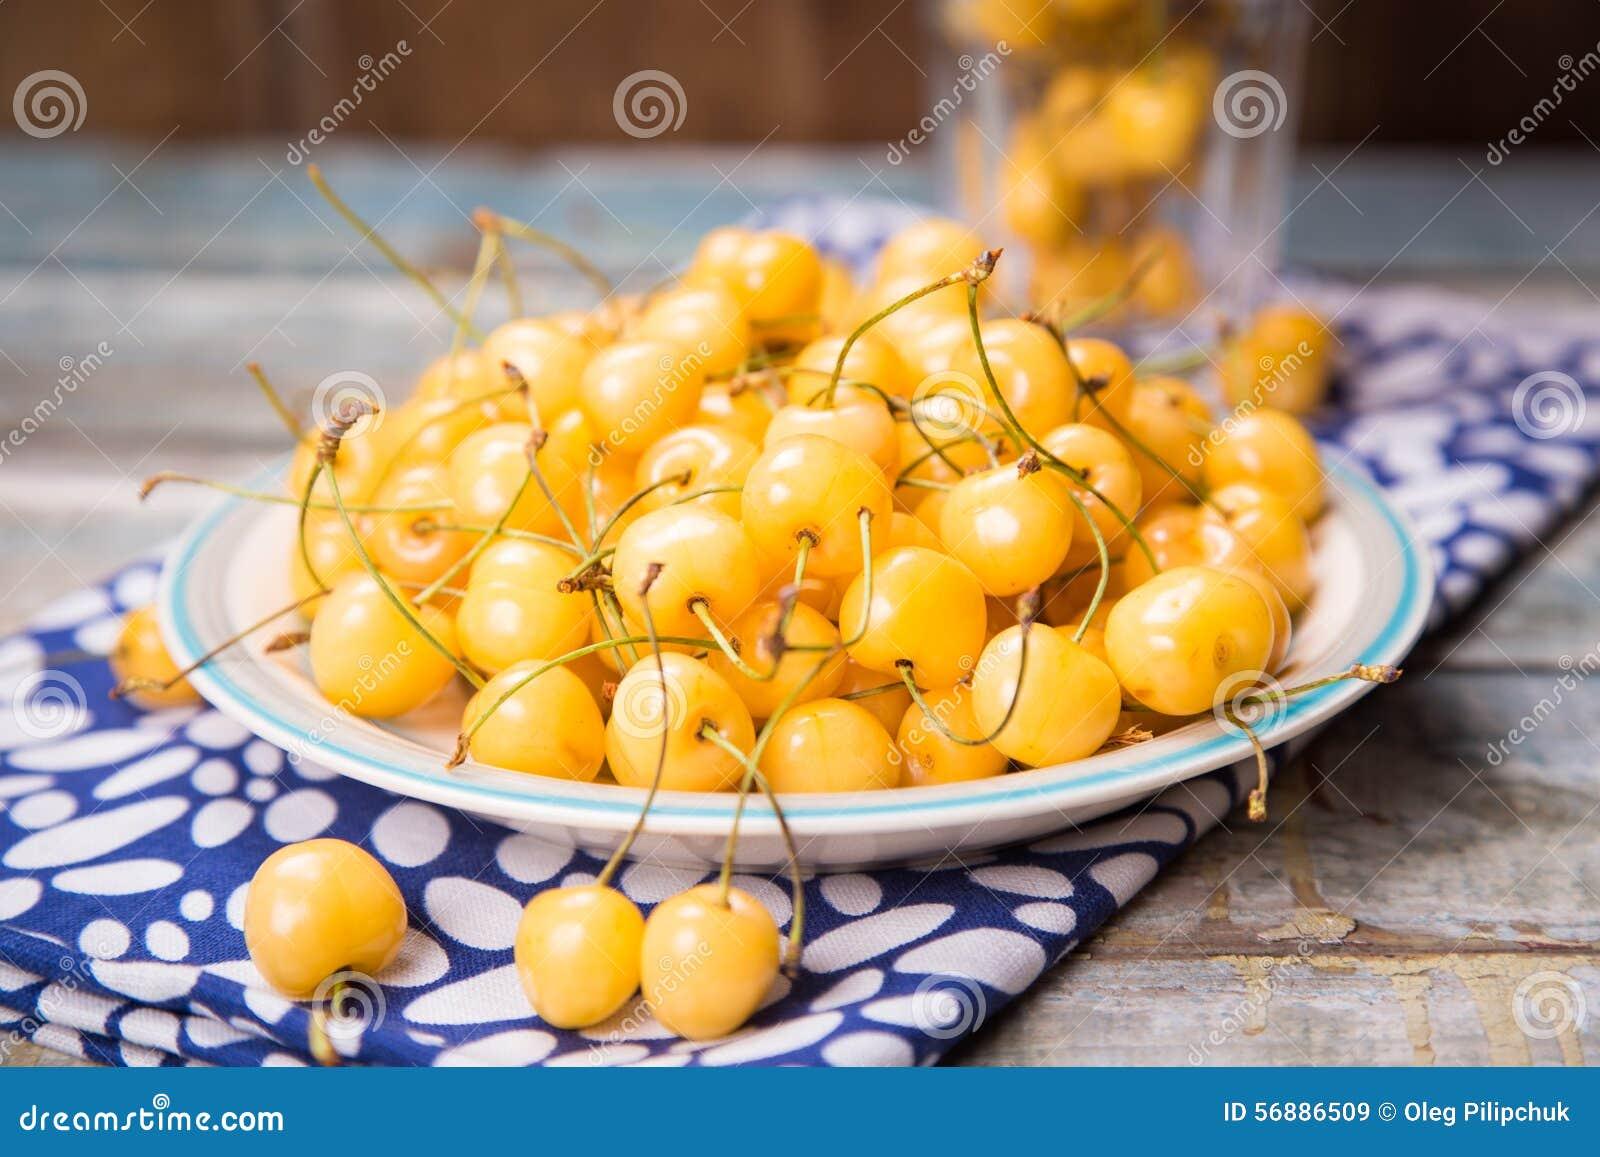 Süße Kirsche